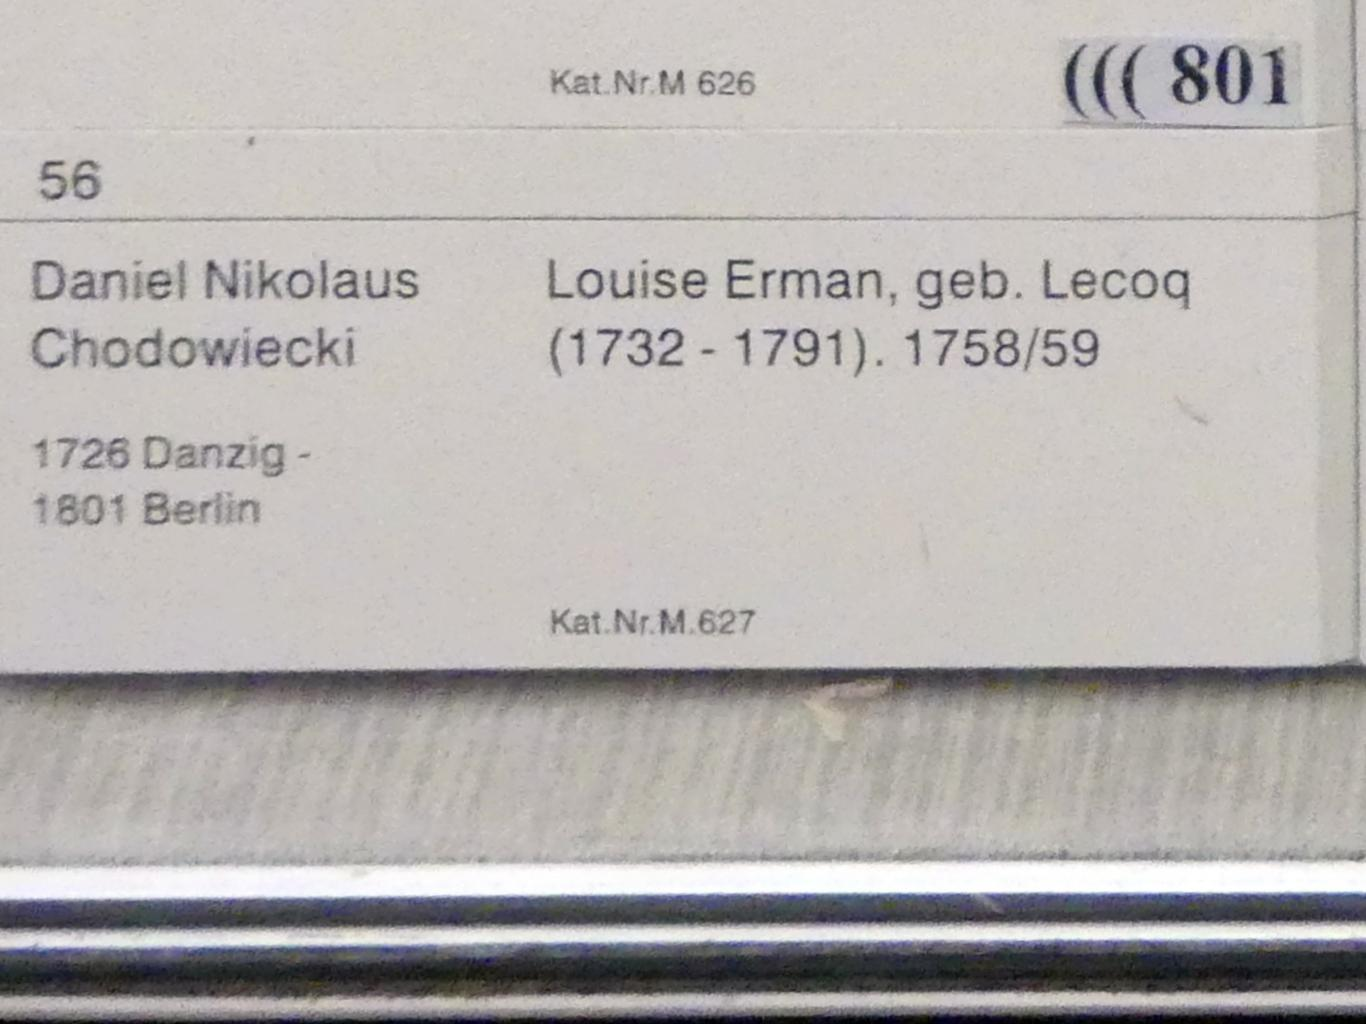 Daniel Nikolaus Chodowiecki: Louise Erman, geb. Lecoq (1732-1791), 1758 - 1759